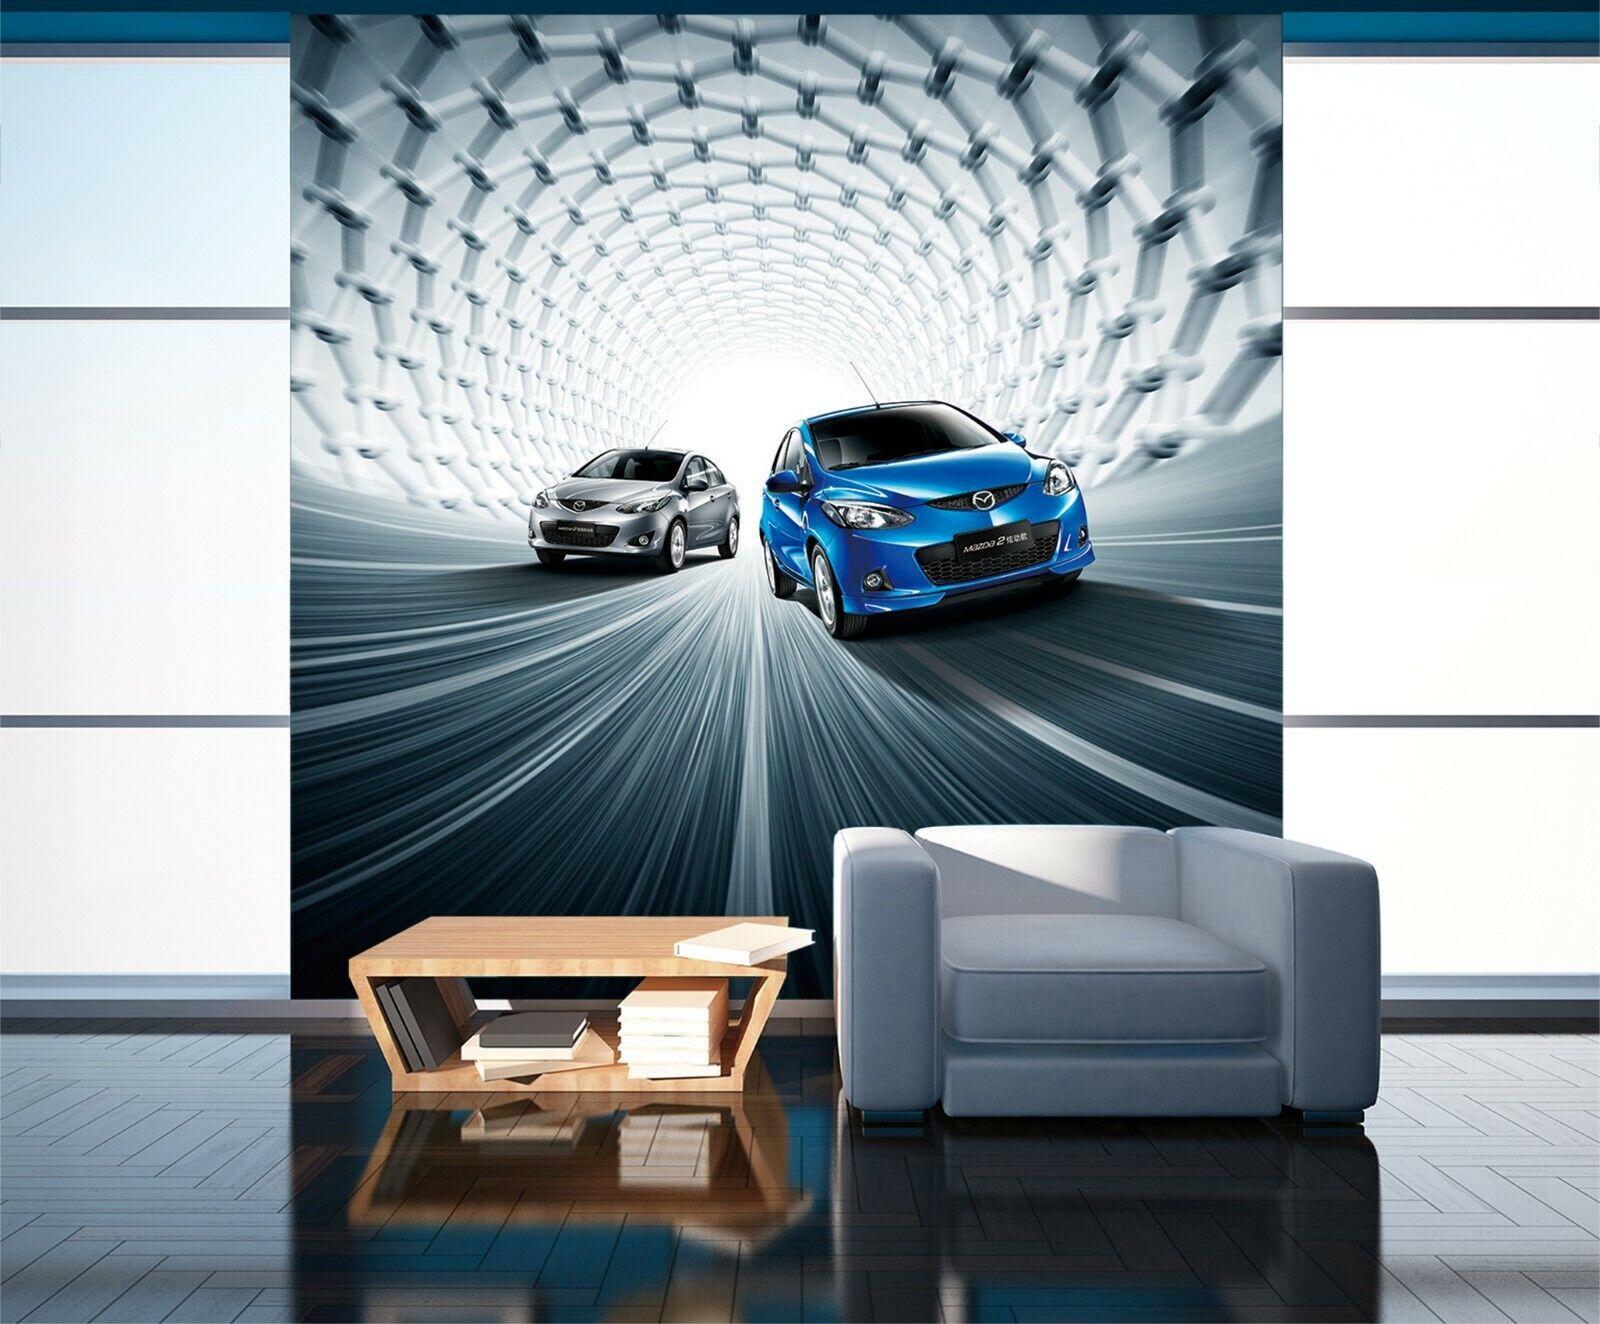 3D Mazda Car I23 Transport Wallpaper Mural Sefl-adhesive Removable Angelia